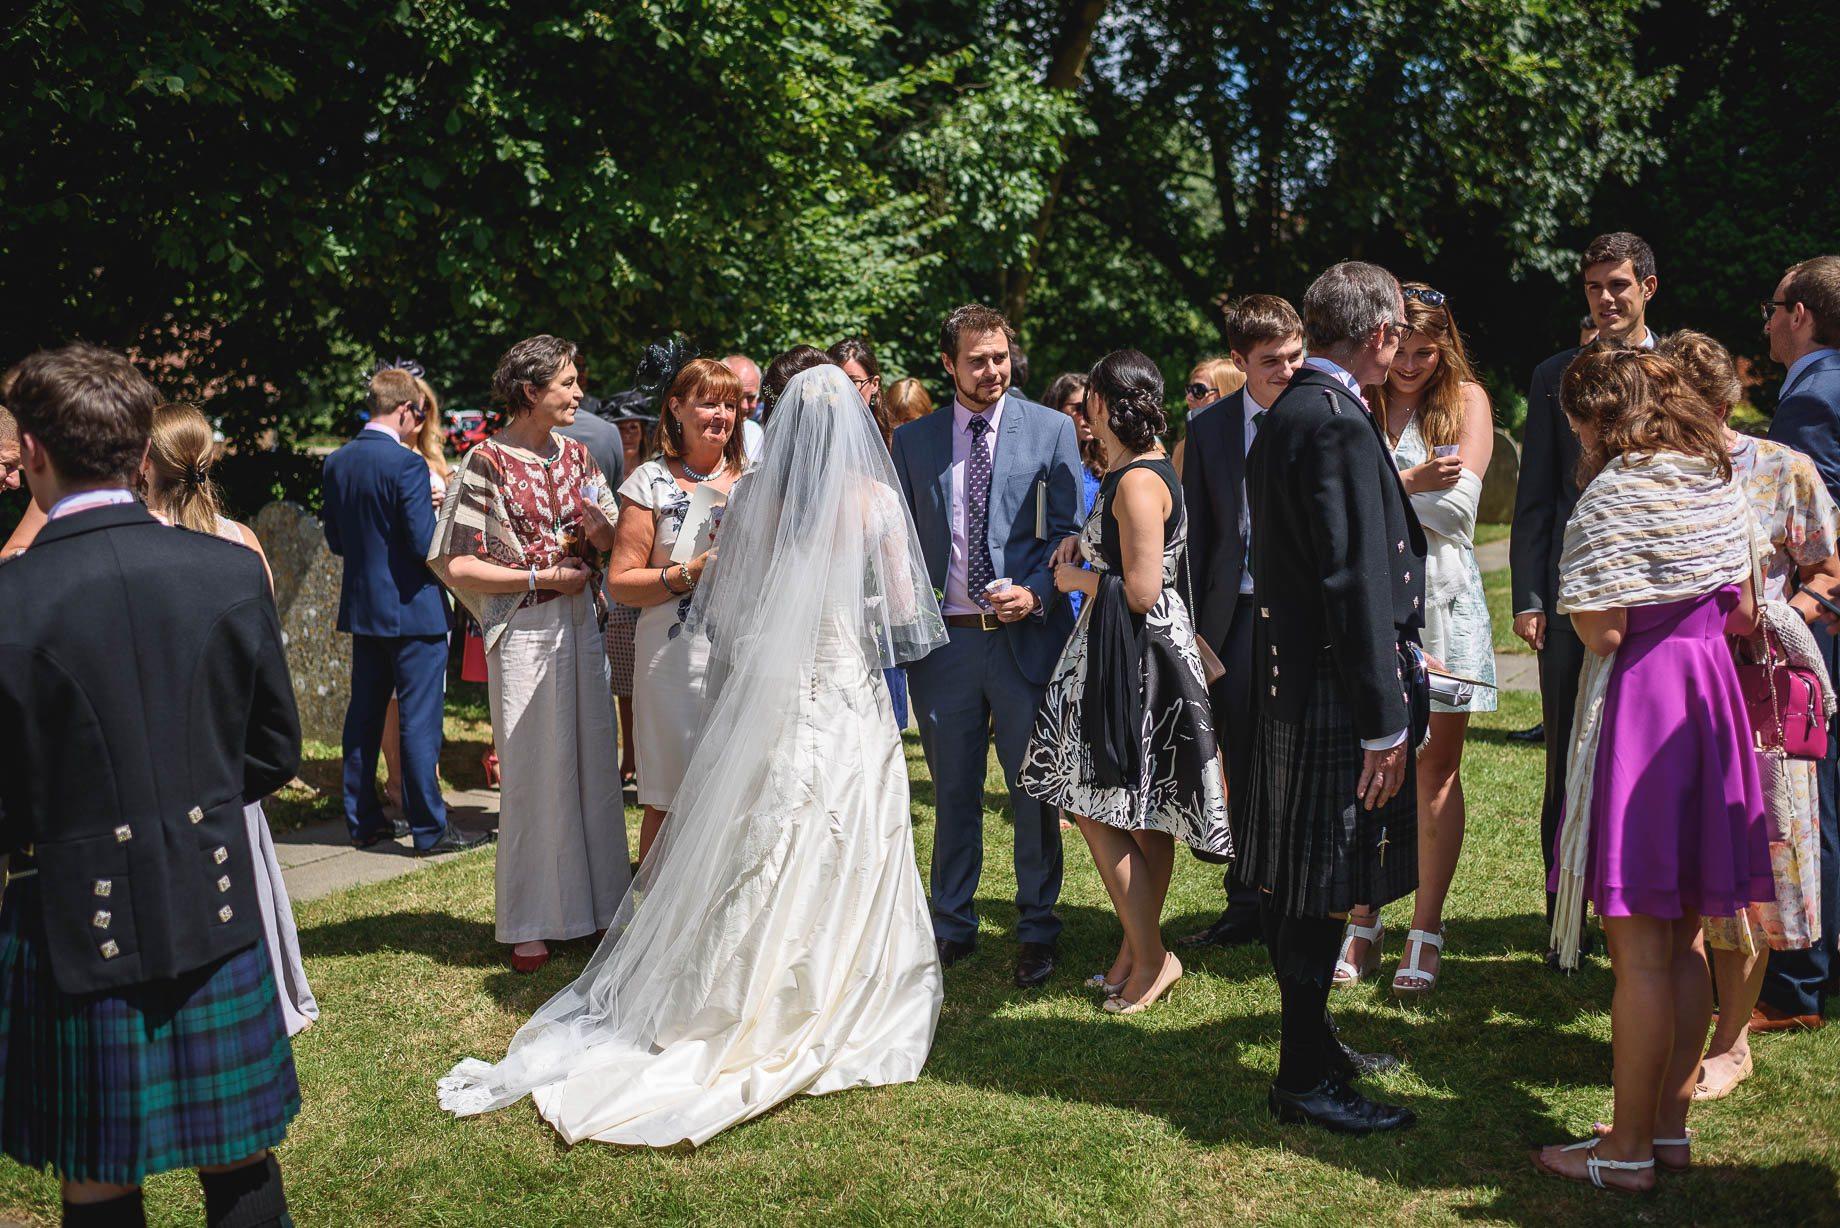 Gildings Barn wedding photography - Sarah and Steve (67 of 190)